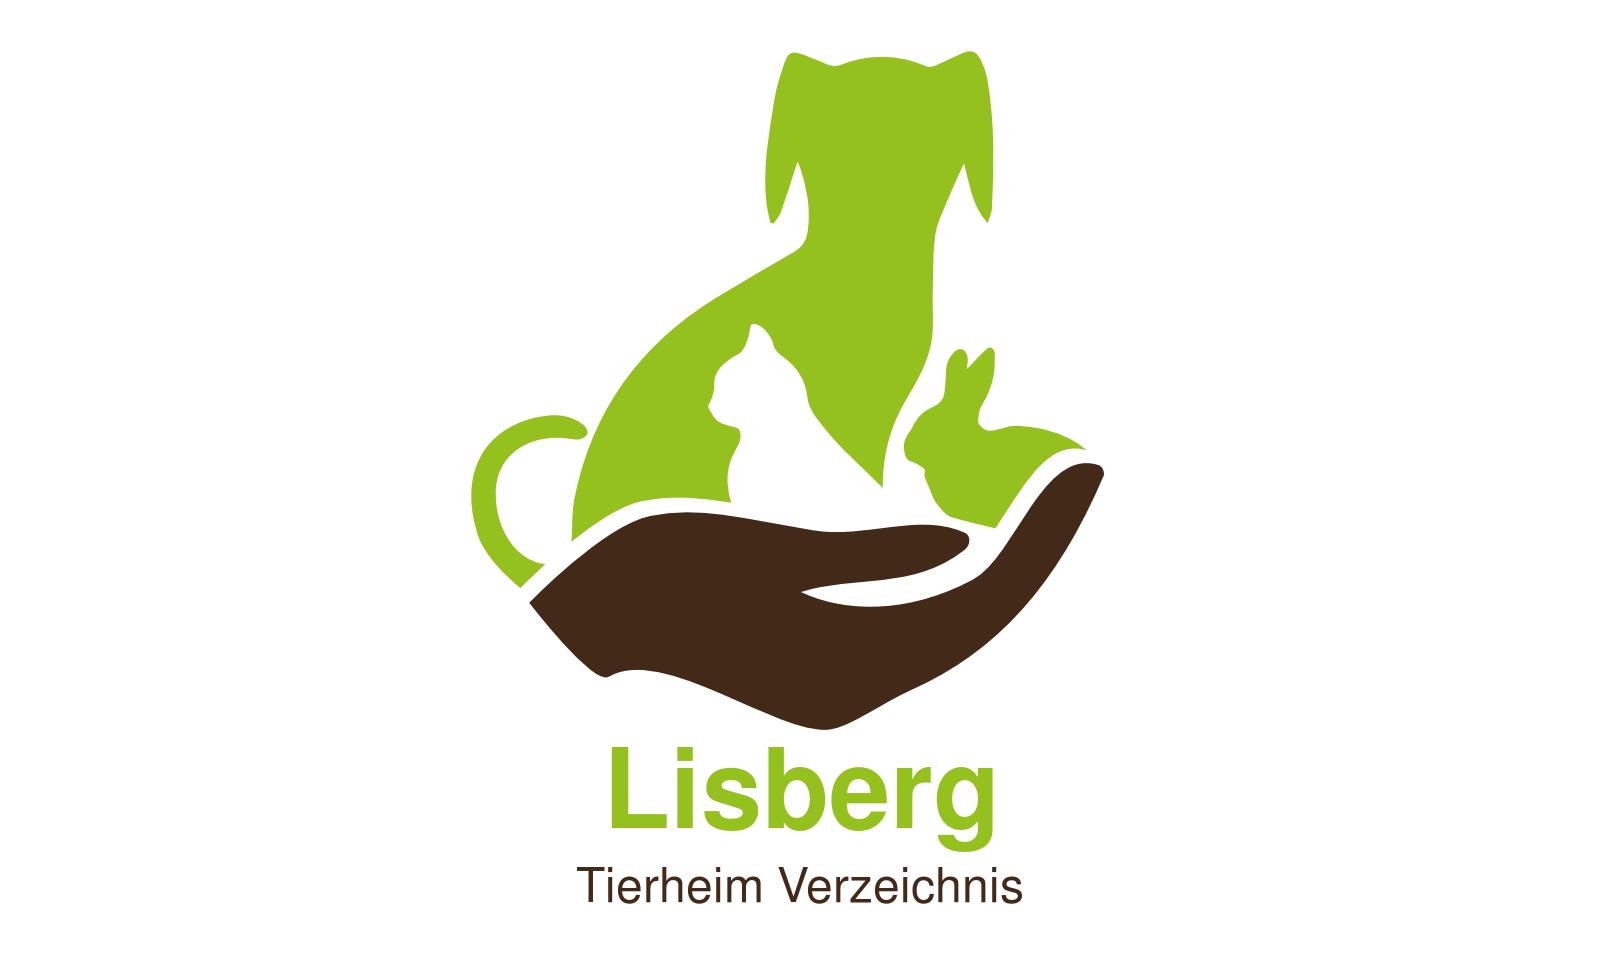 Tierheim Lisberg